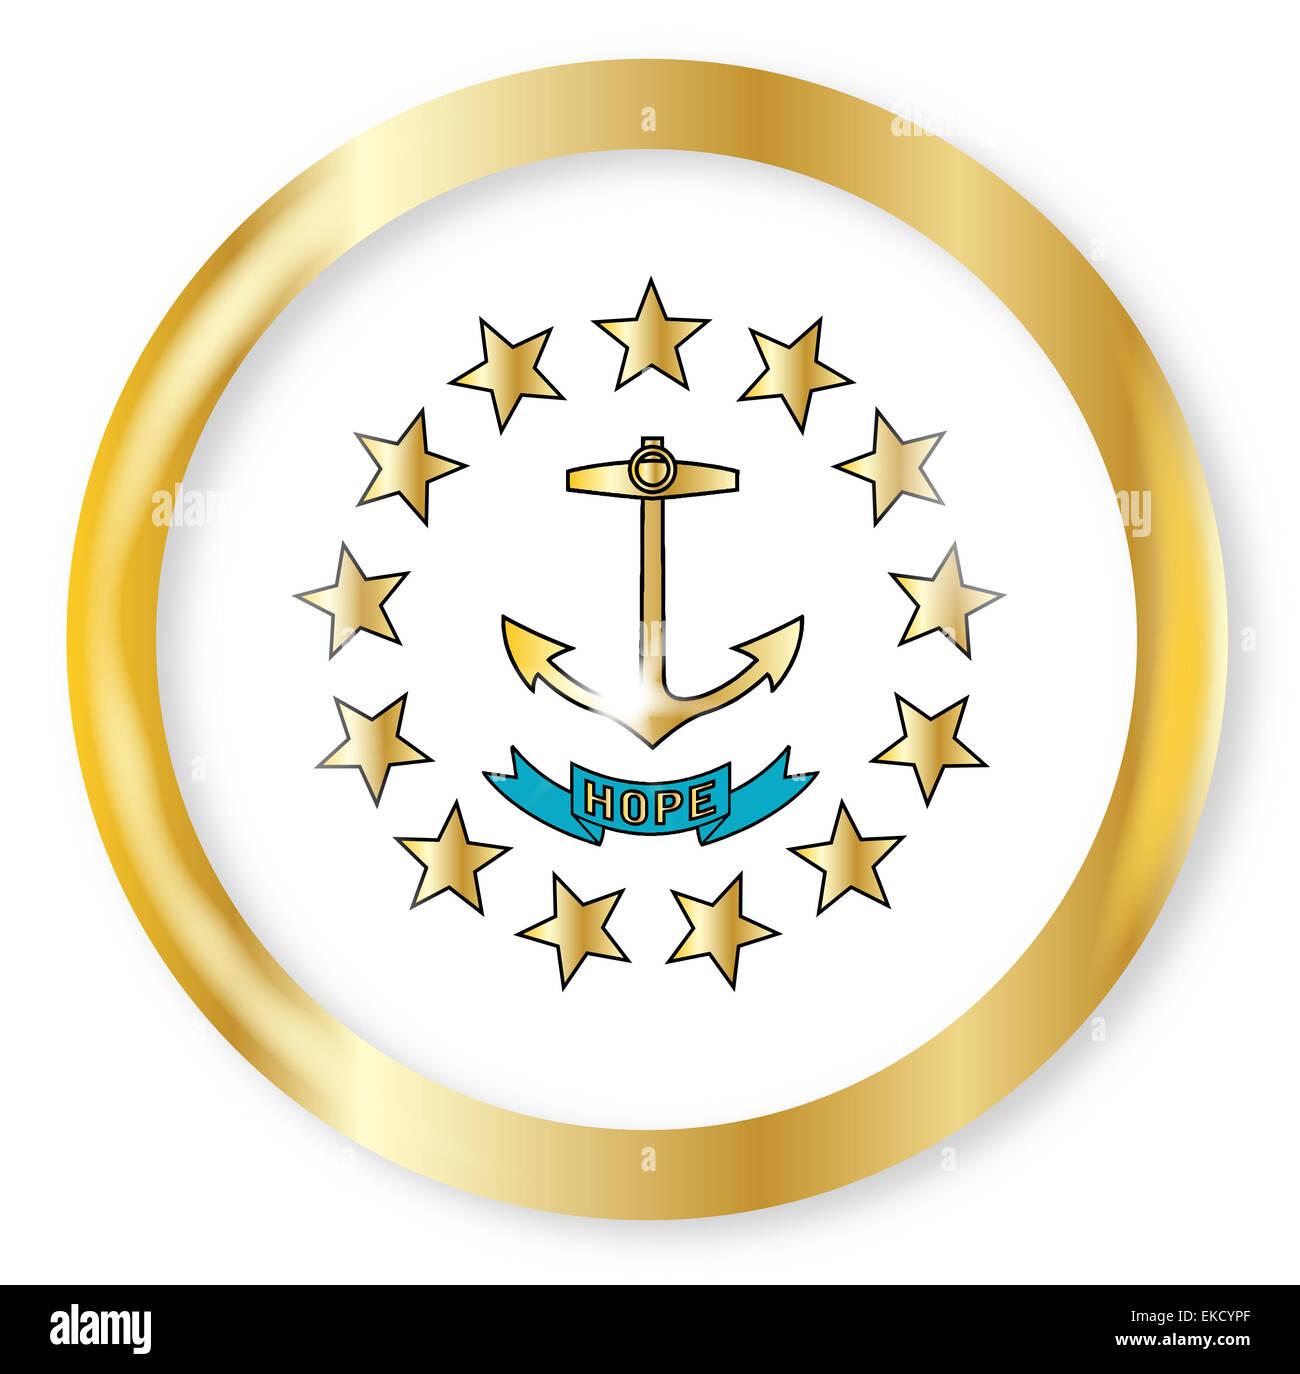 Rhode Island State Flag Button With A Gold Metal Circular Border